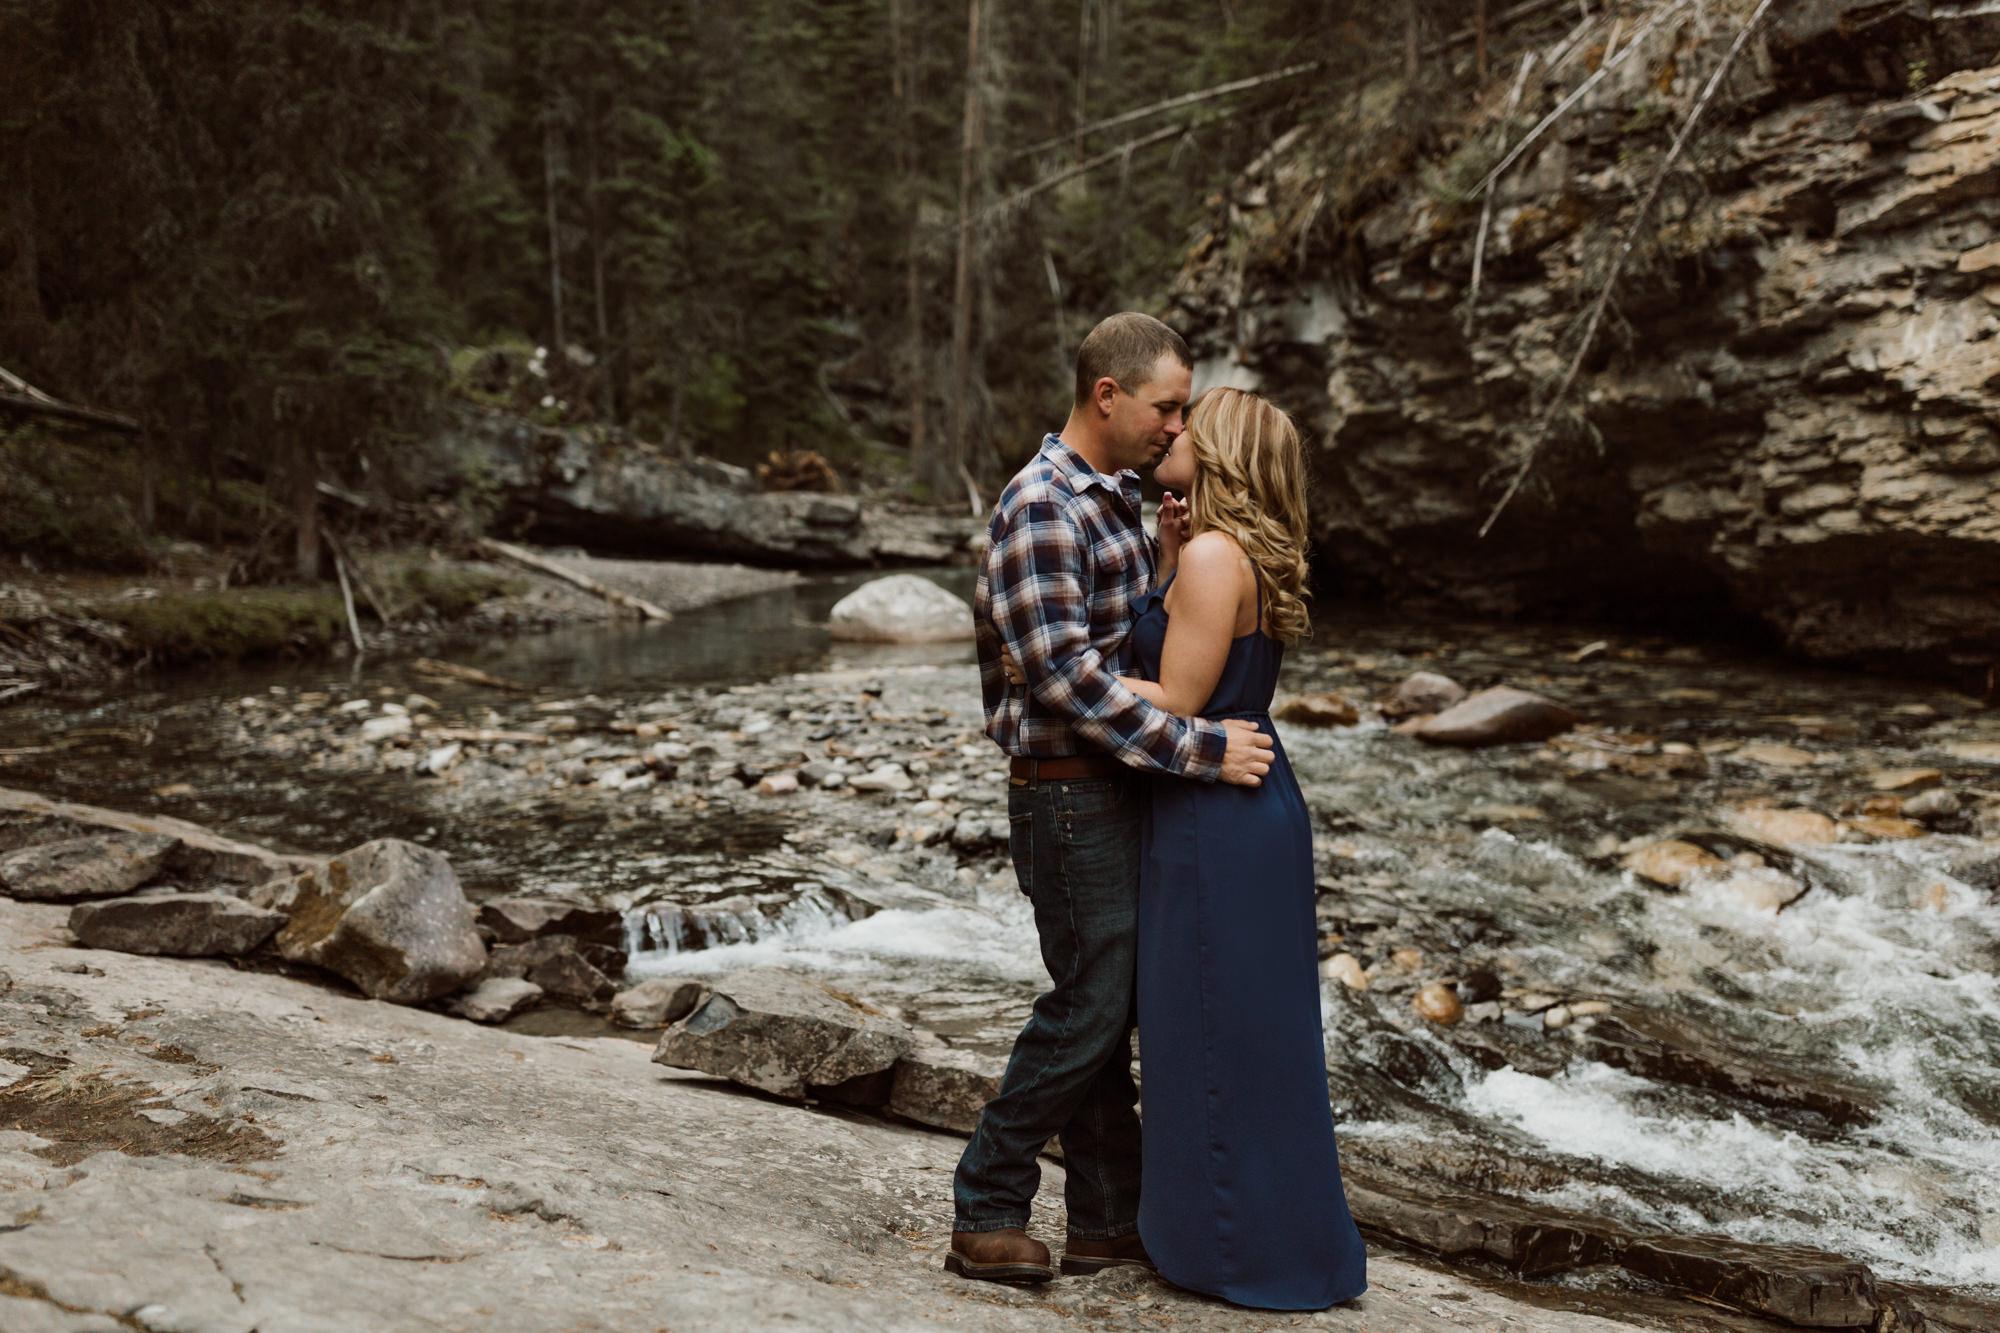 banff-engagements-destination-wedding-photographer-30.jpg